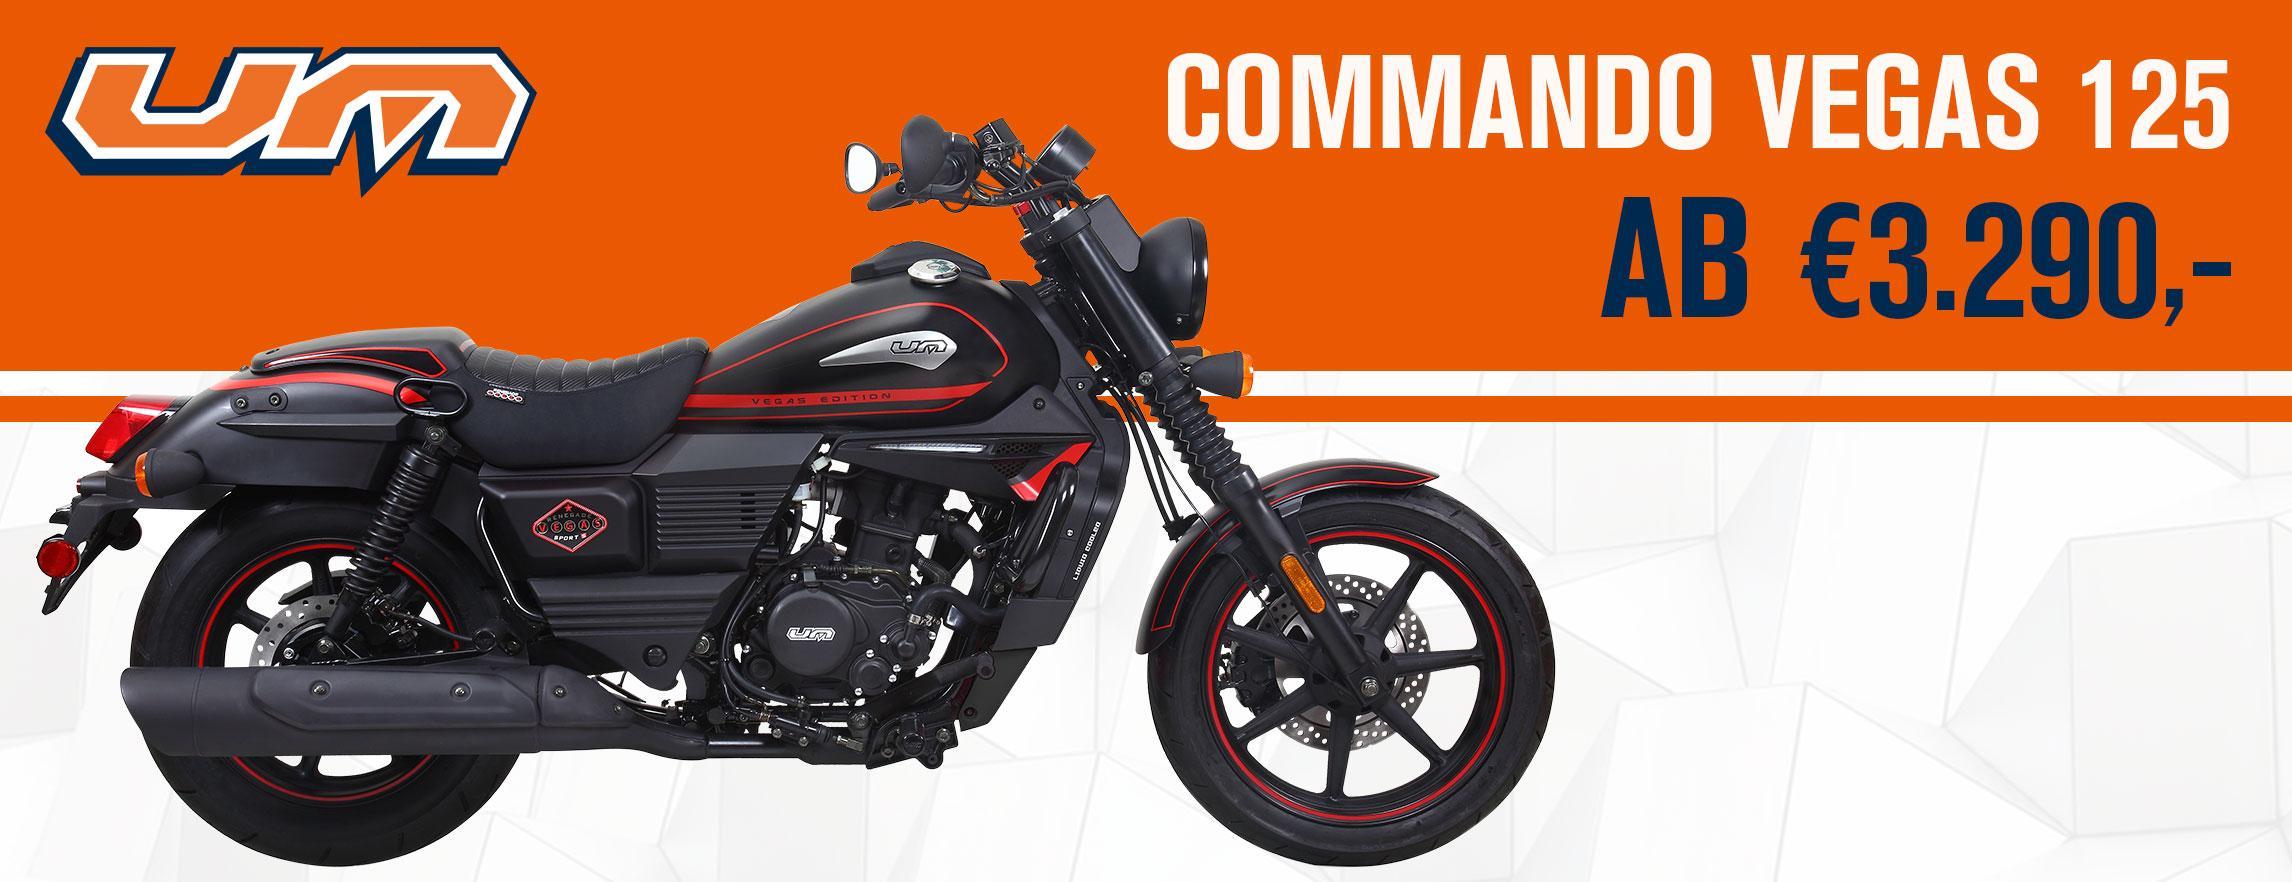 Commando Vegas 125